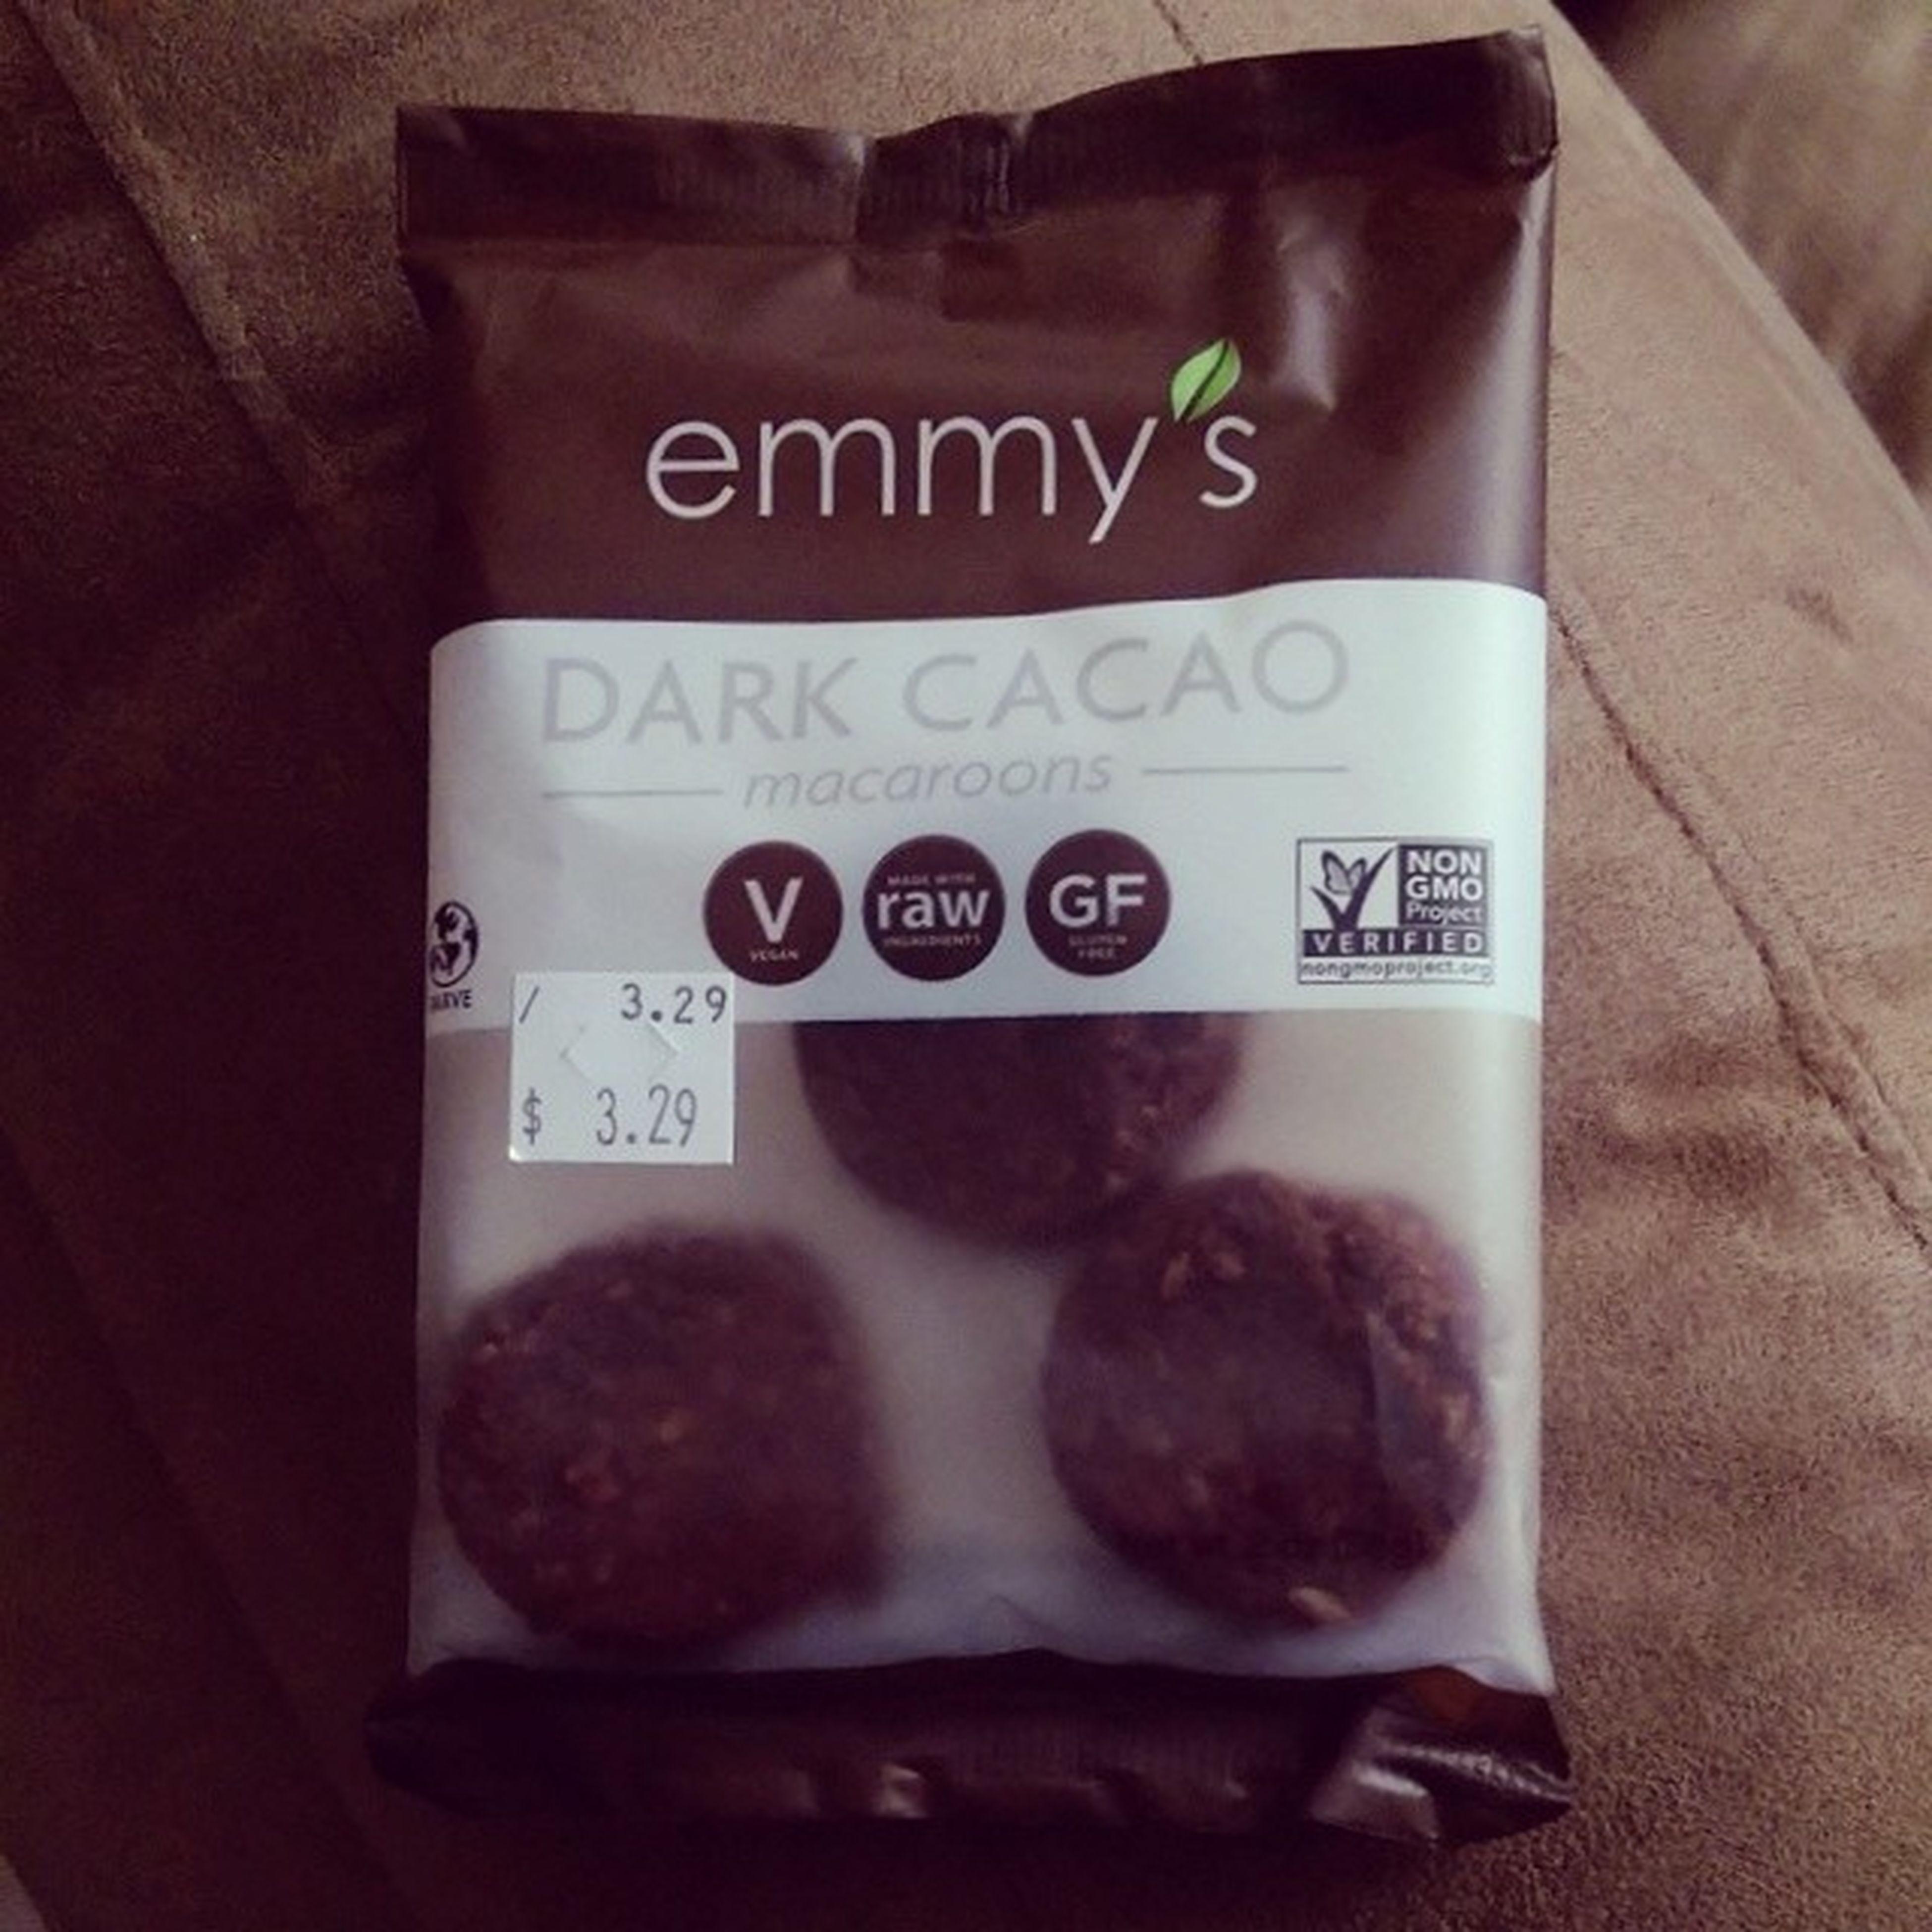 Darkcacao Macaroons Vegan Raw nongmoprojectverified emmysorganics madeinnewyork